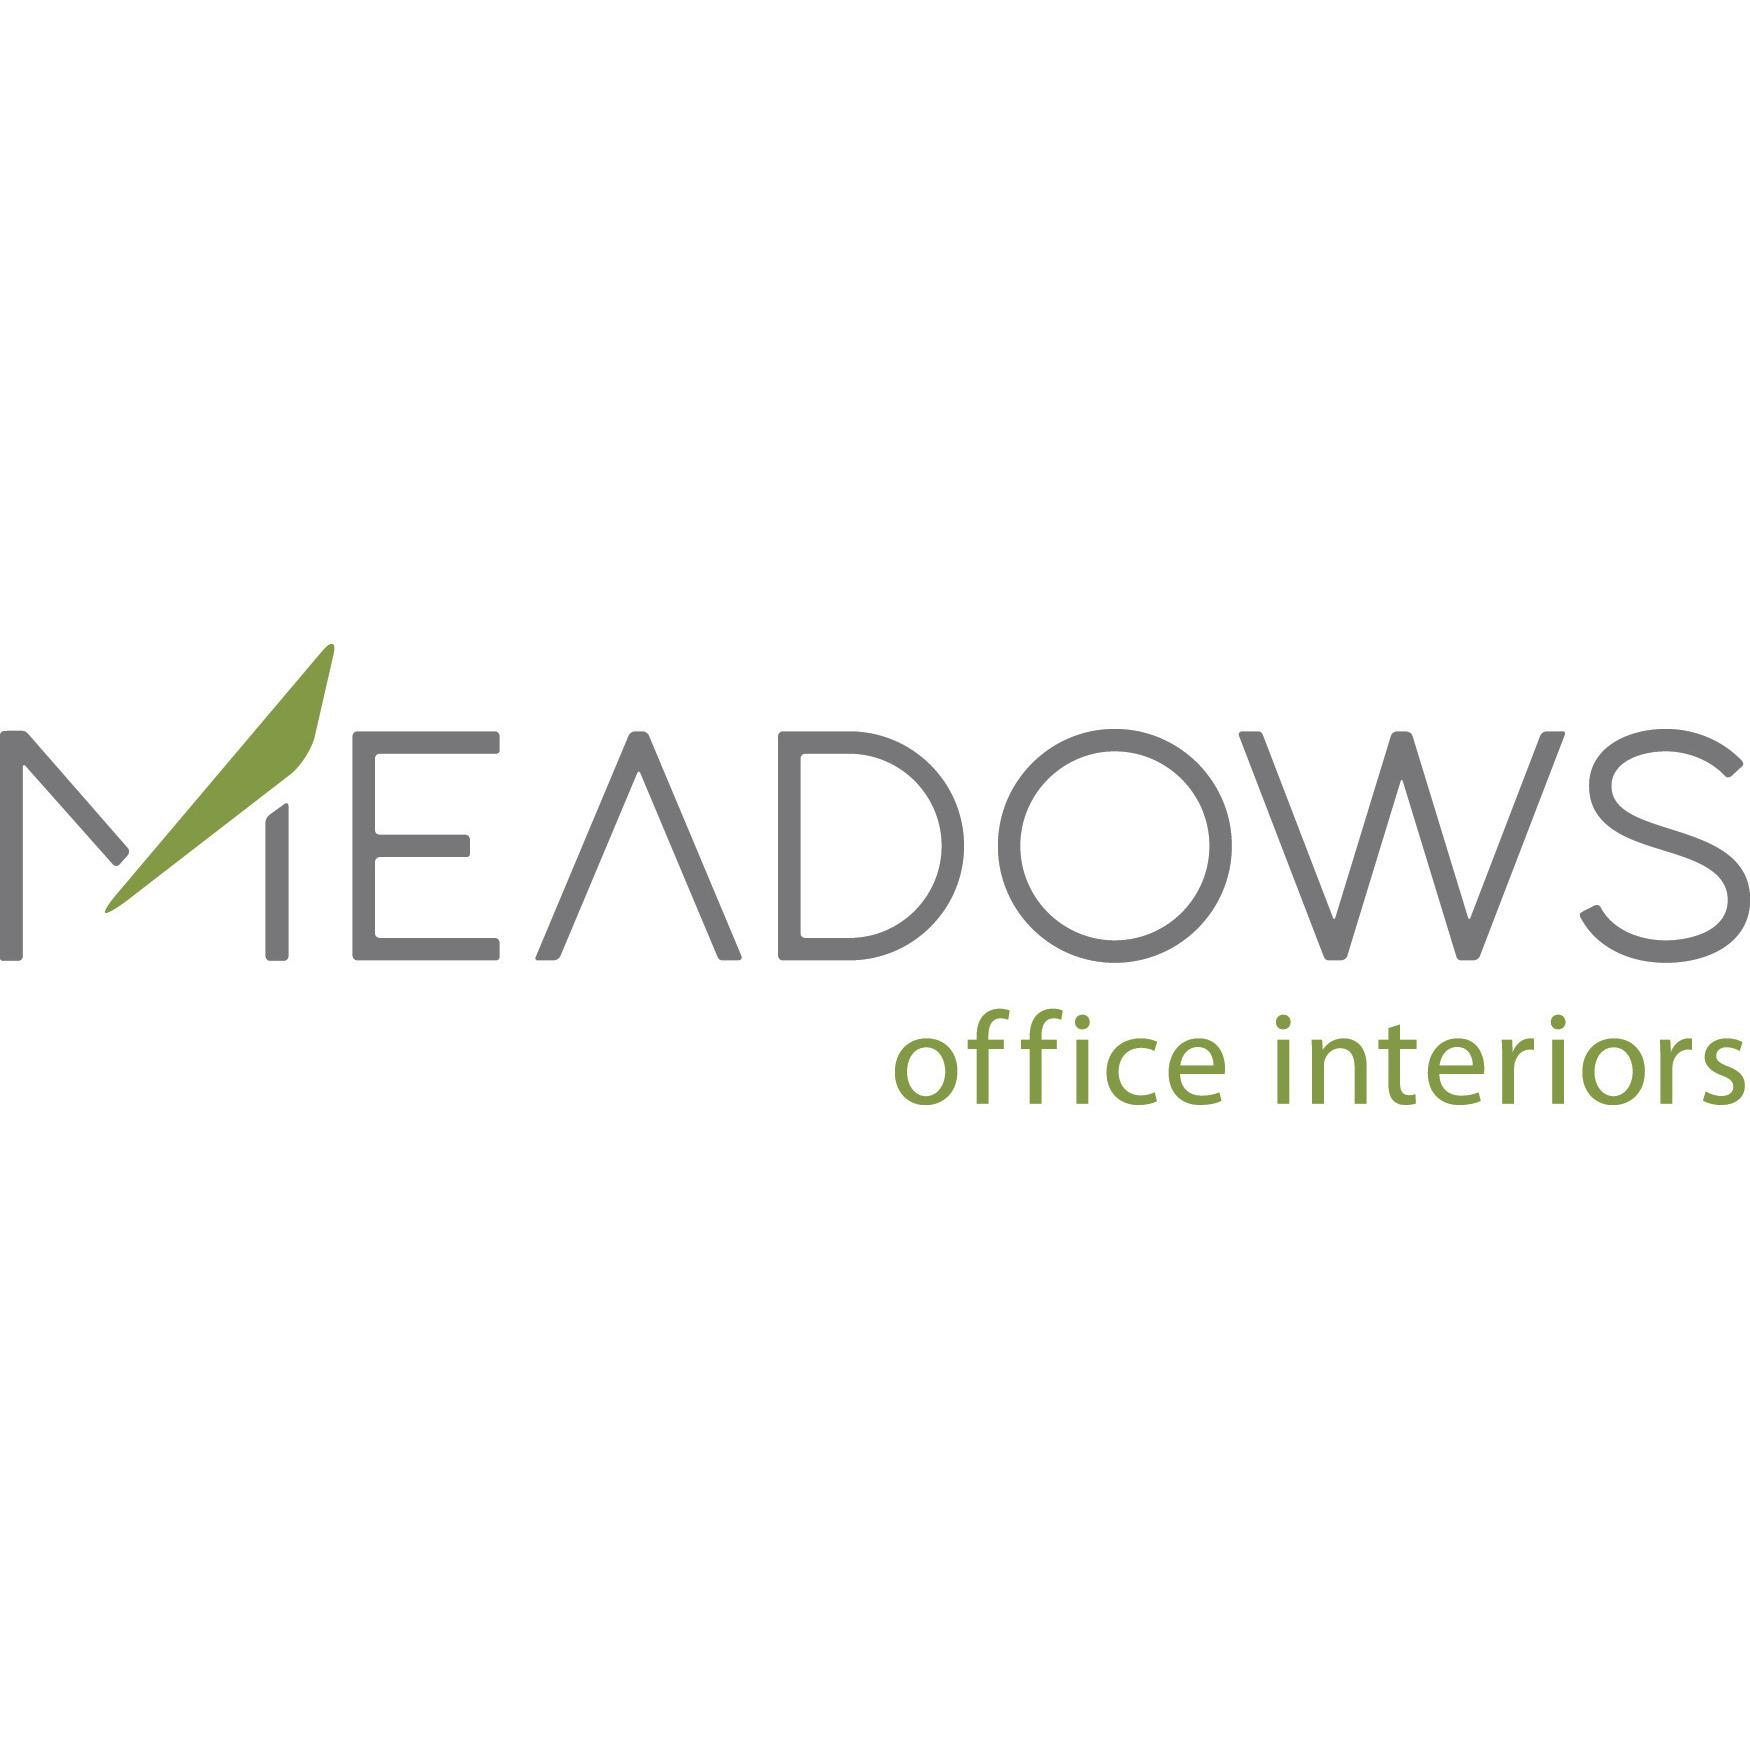 Meadows Office Interiors In New York Ny 212 741 0